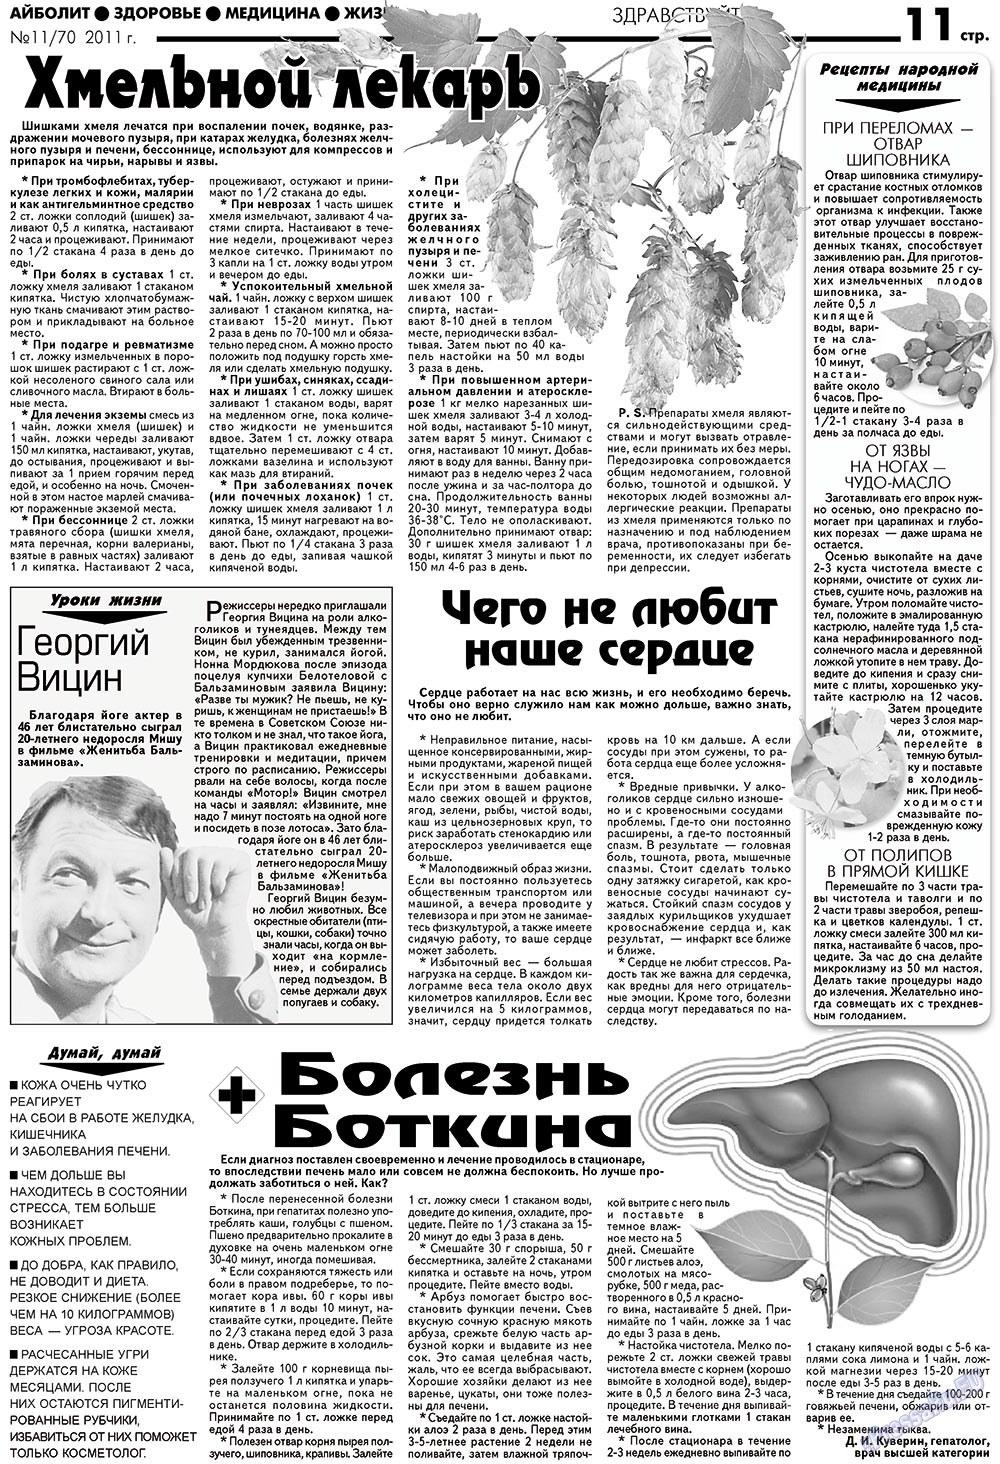 АйБолит (газета). 2011 год, номер 11, стр. 11